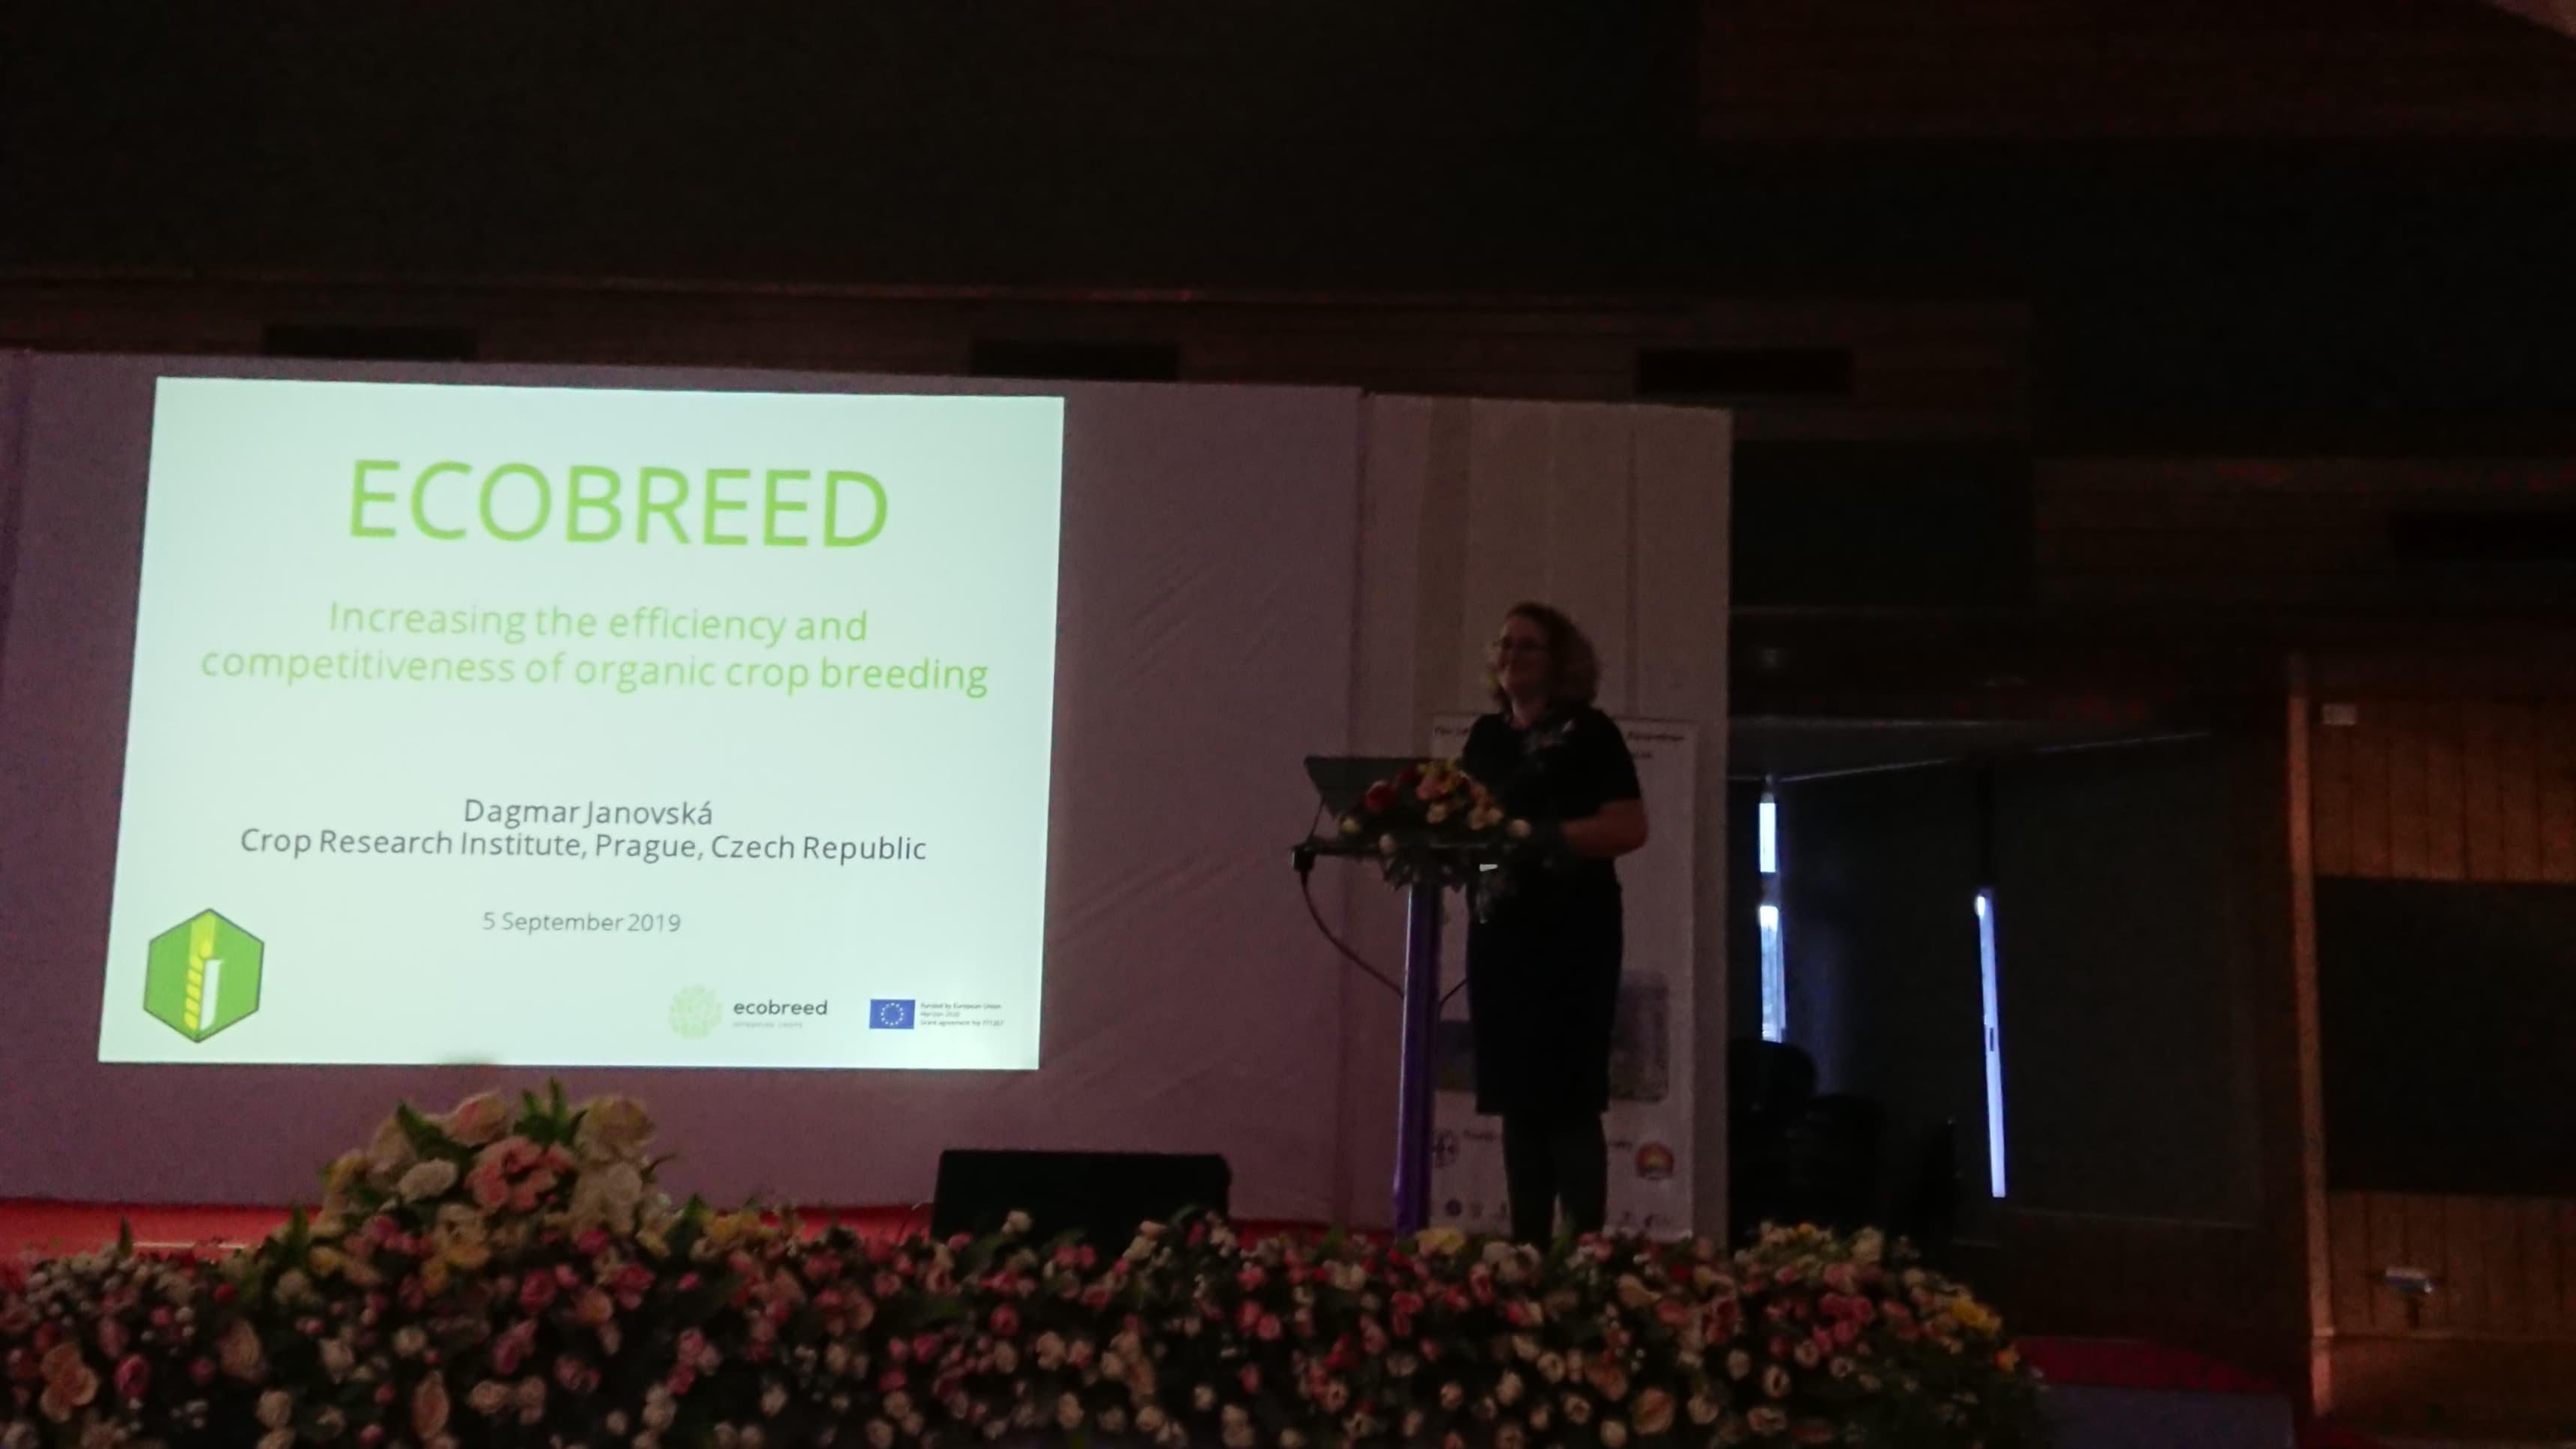 ECOBREED presented at the 14th International Symposium on Buckwheat